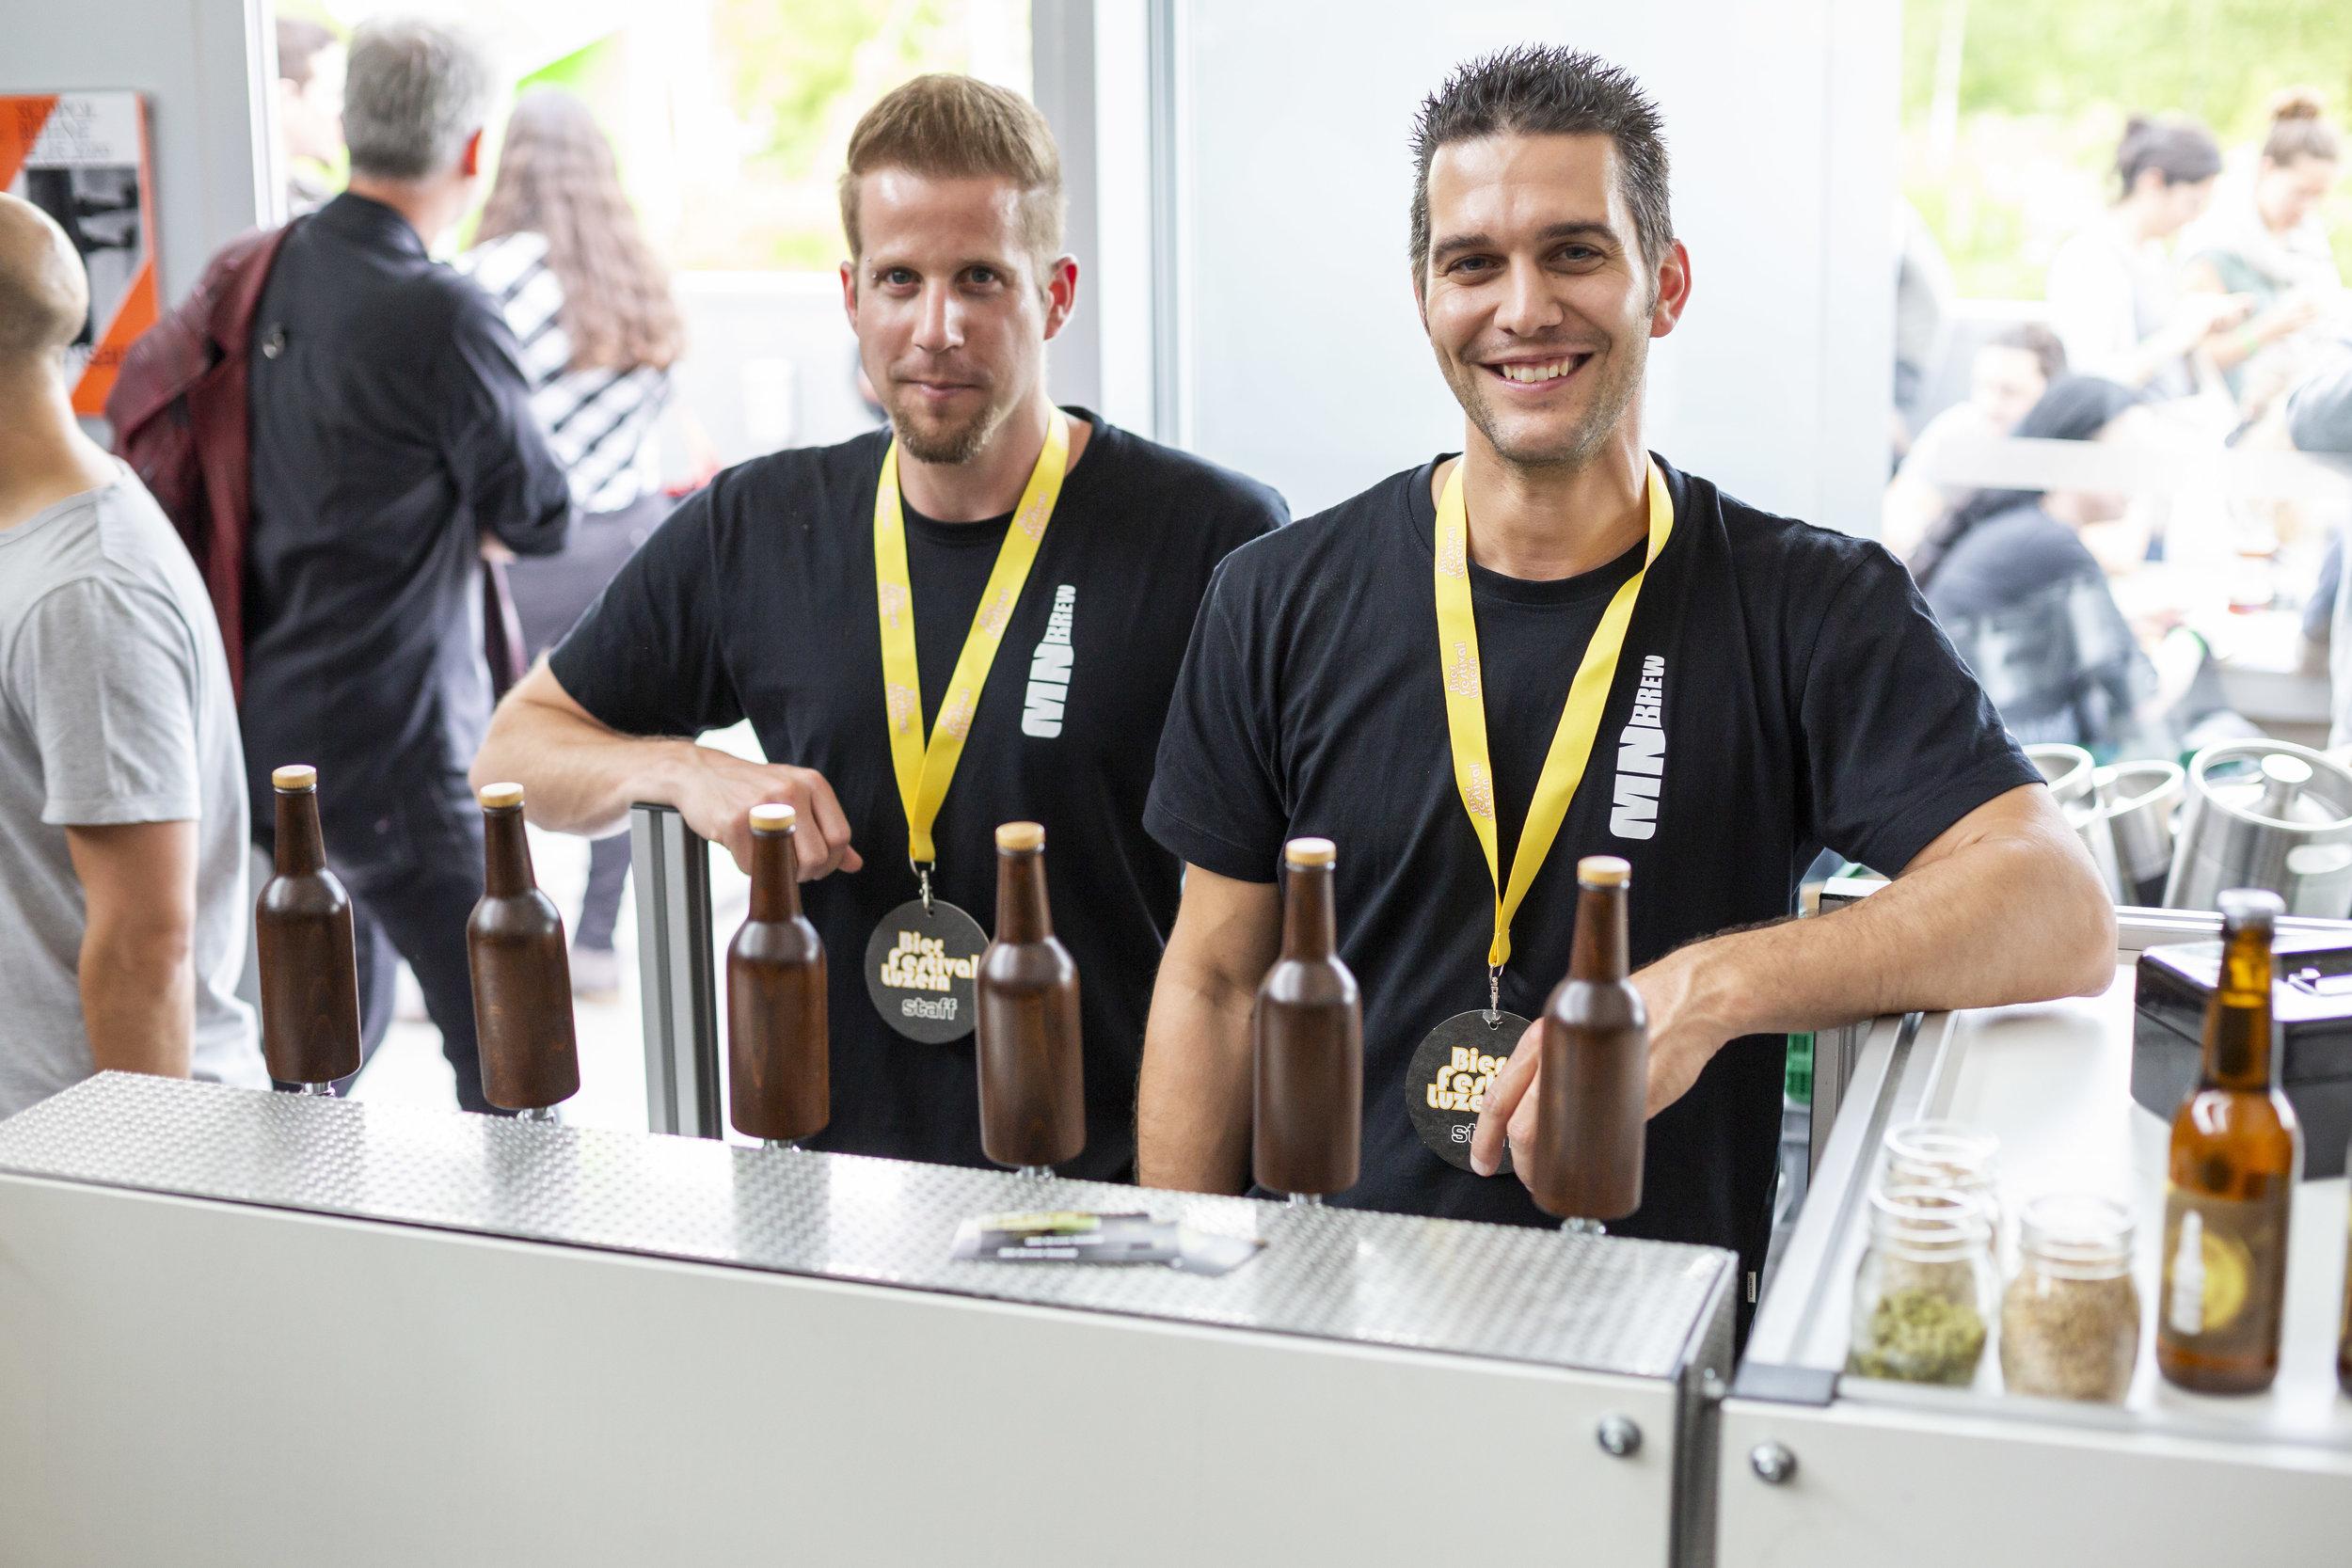 BierfestivalLuzern-18.jpg